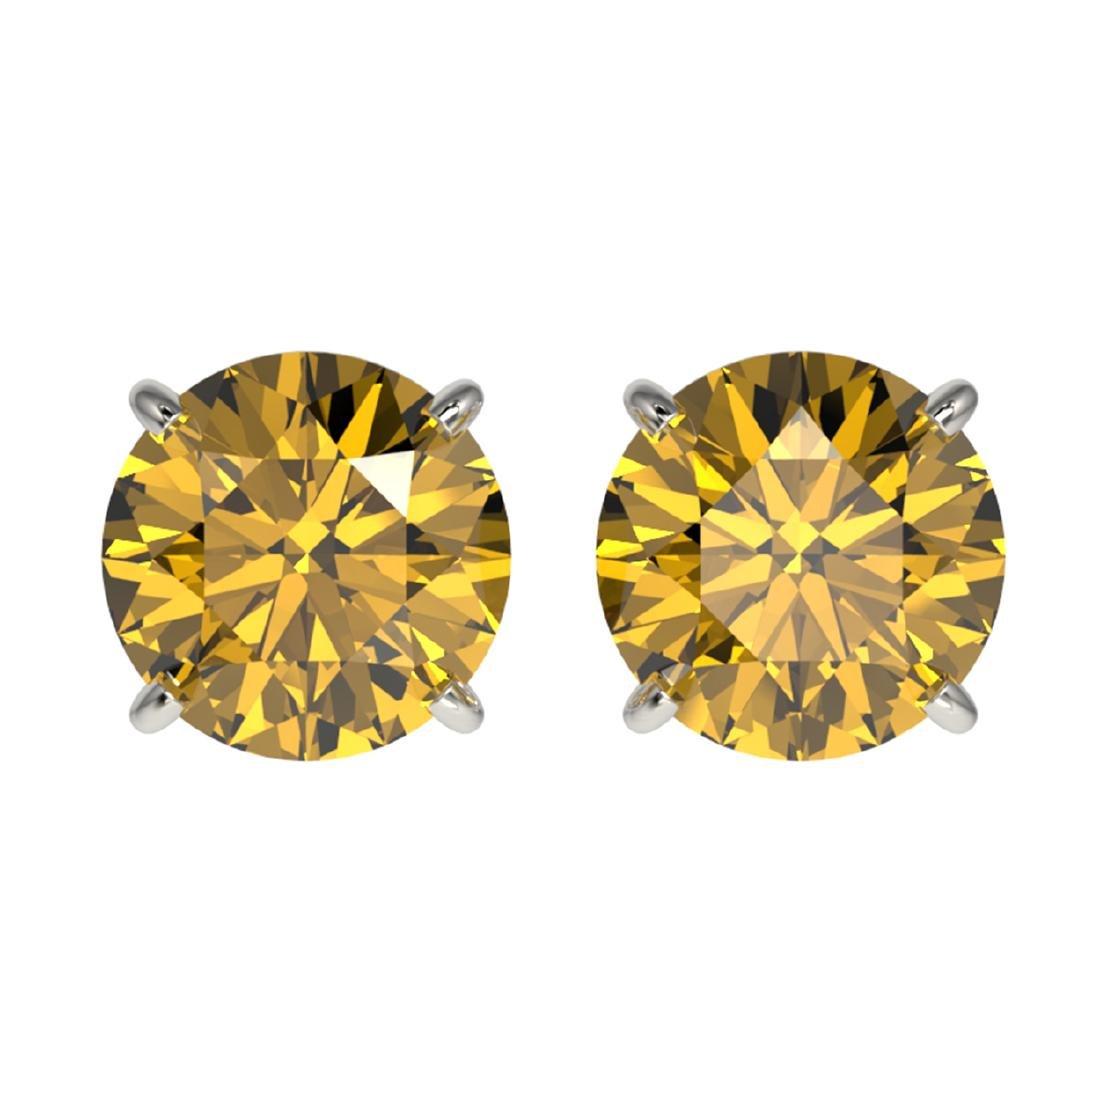 1.92 ctw Intense Yellow Diamond Stud Earrings 10K White